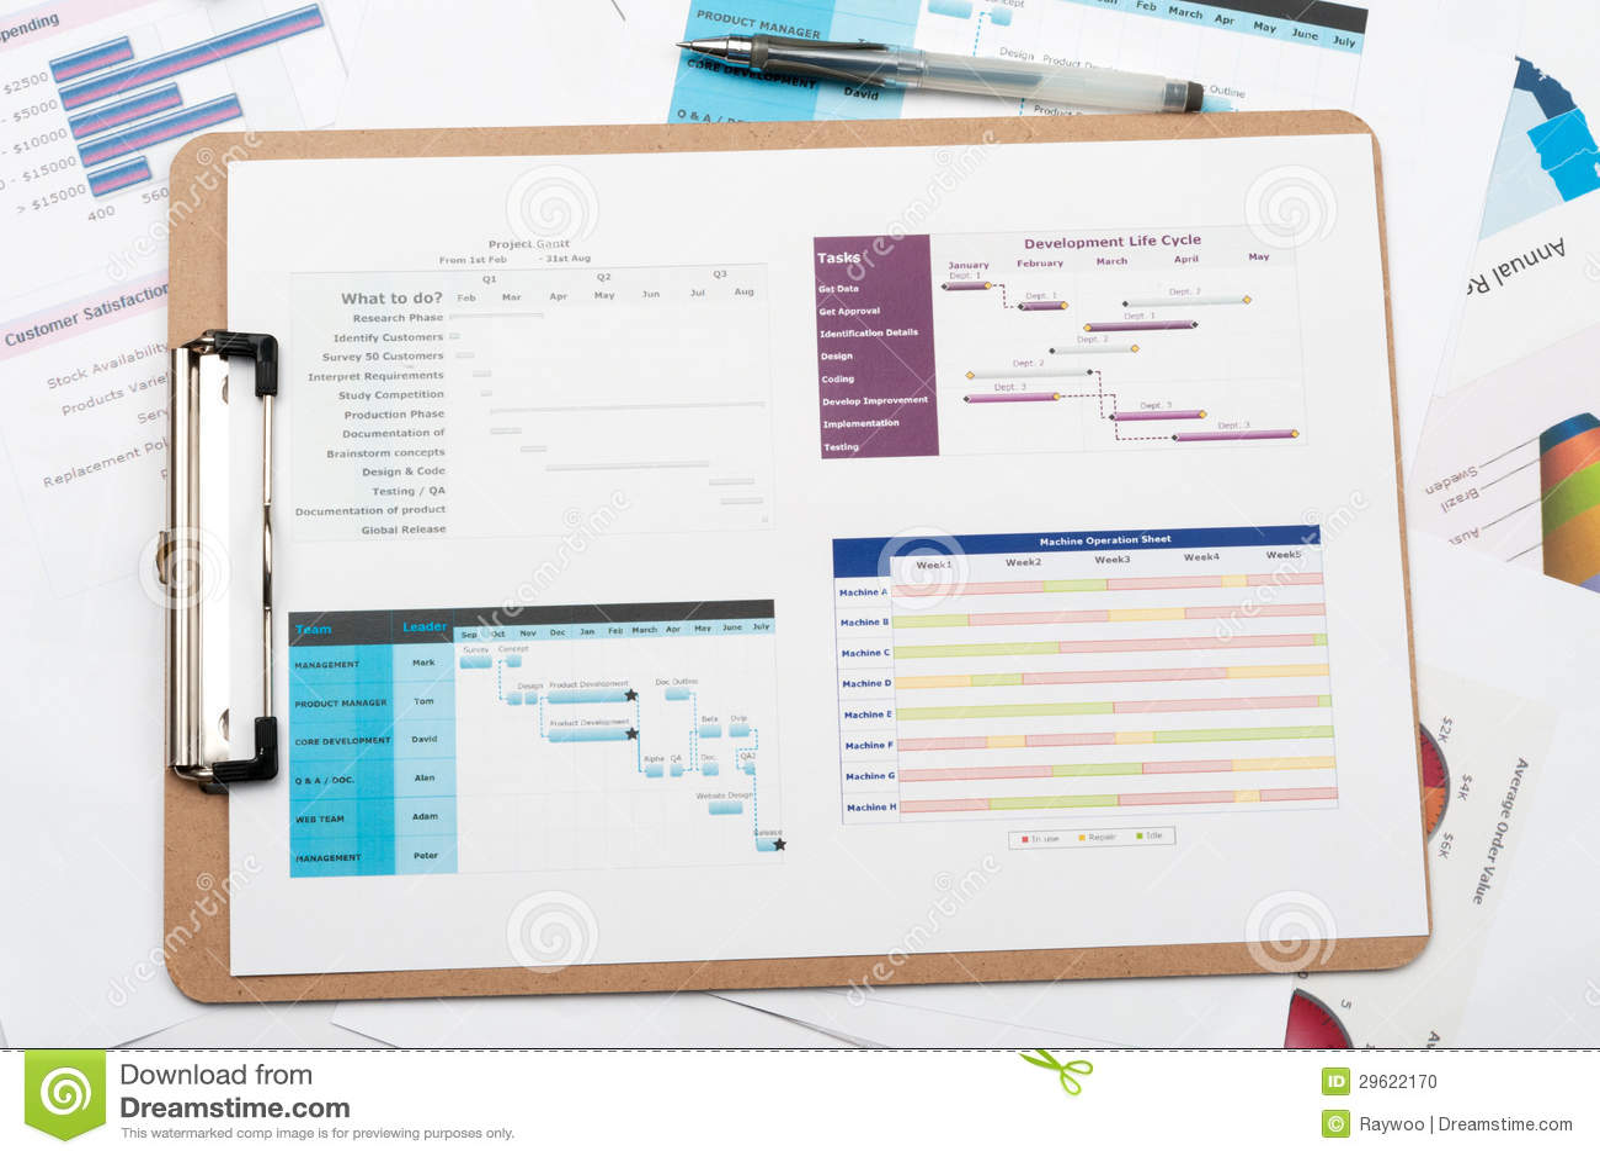 Diagrama de gantt foto de stock imagem de desempenho 29622170 download diagrama de gantt foto de stock imagem de desempenho 29622170 ccuart Gallery